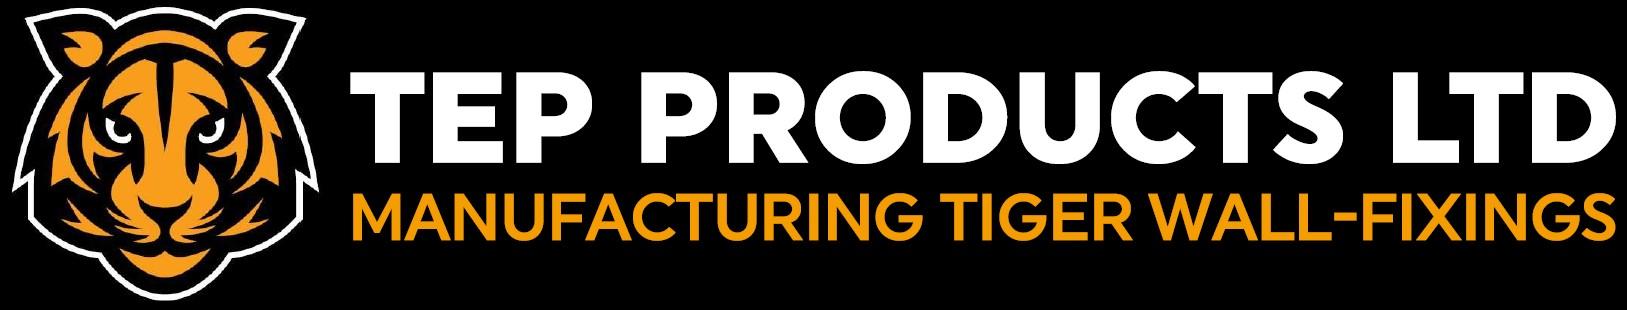 Image of TEP Banner Logo